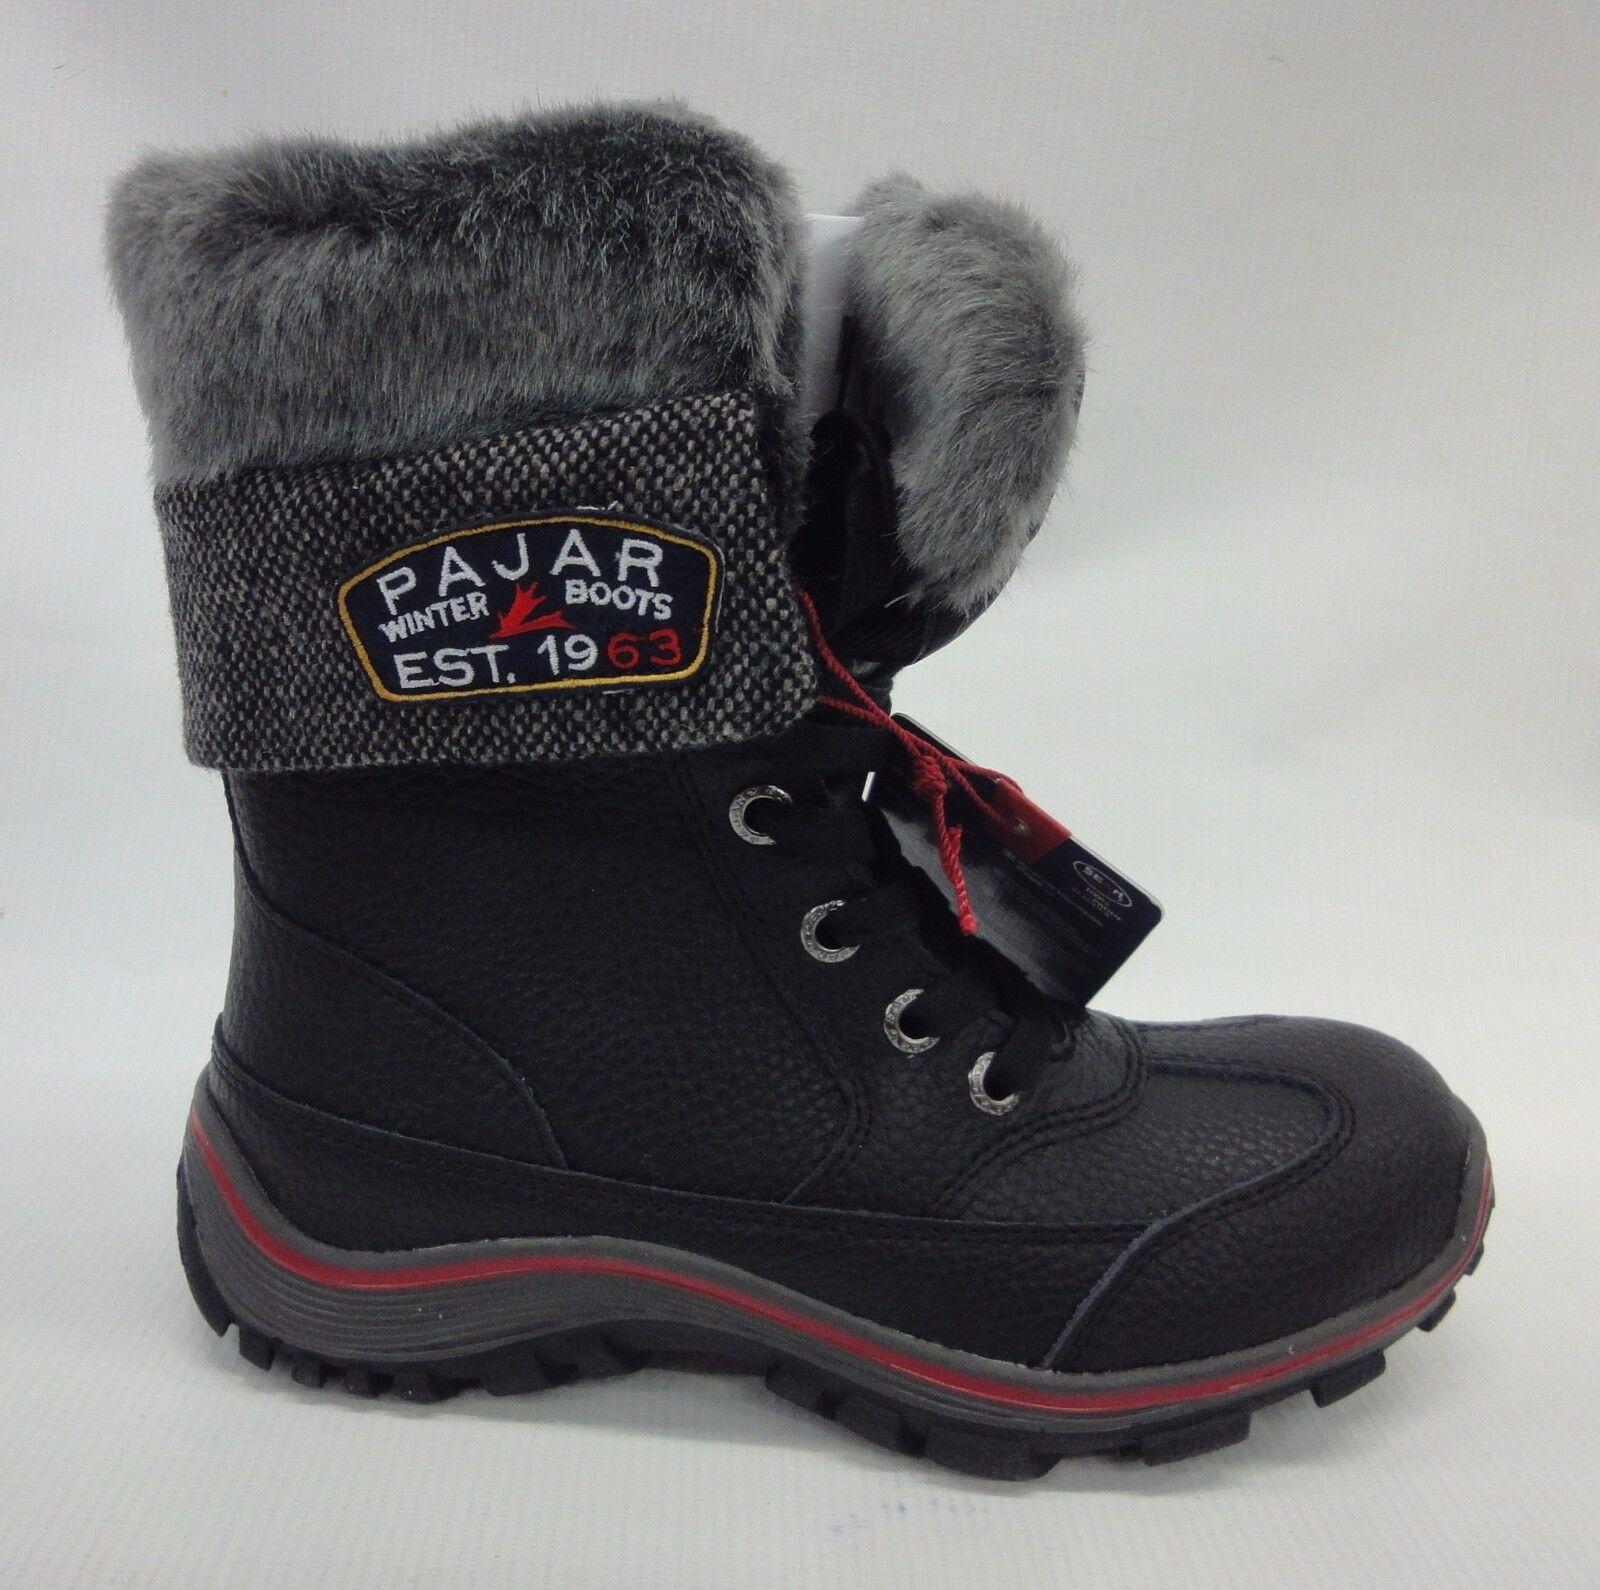 Pajar Womens Alice Boots F15/44438 Black Size 9-9.5 US/40-EU